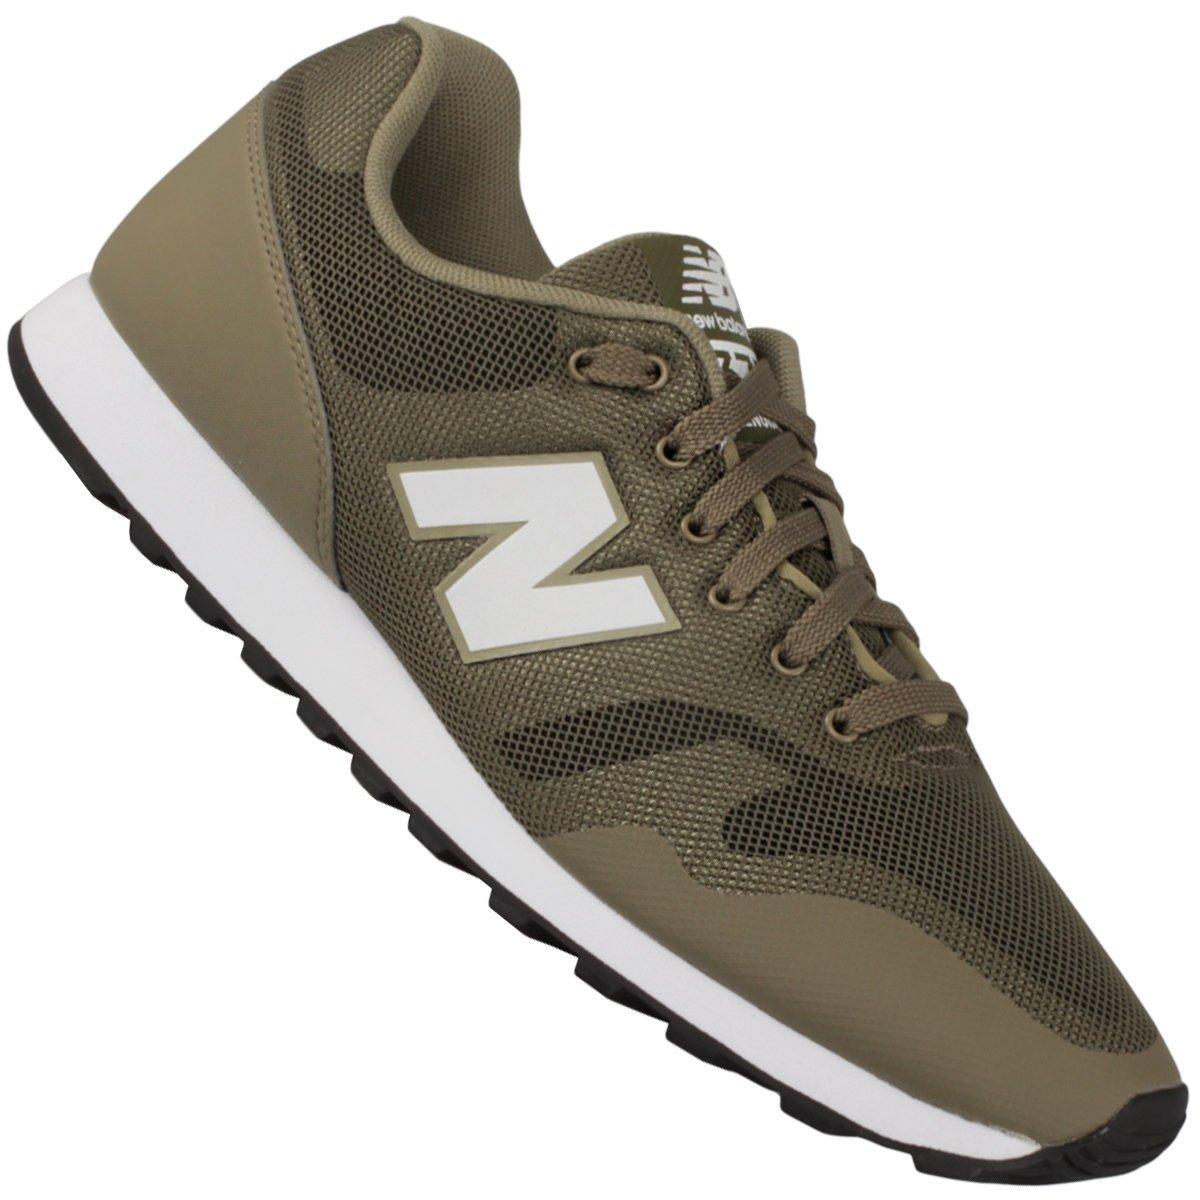 8578453c231 Tênis New Balance 373